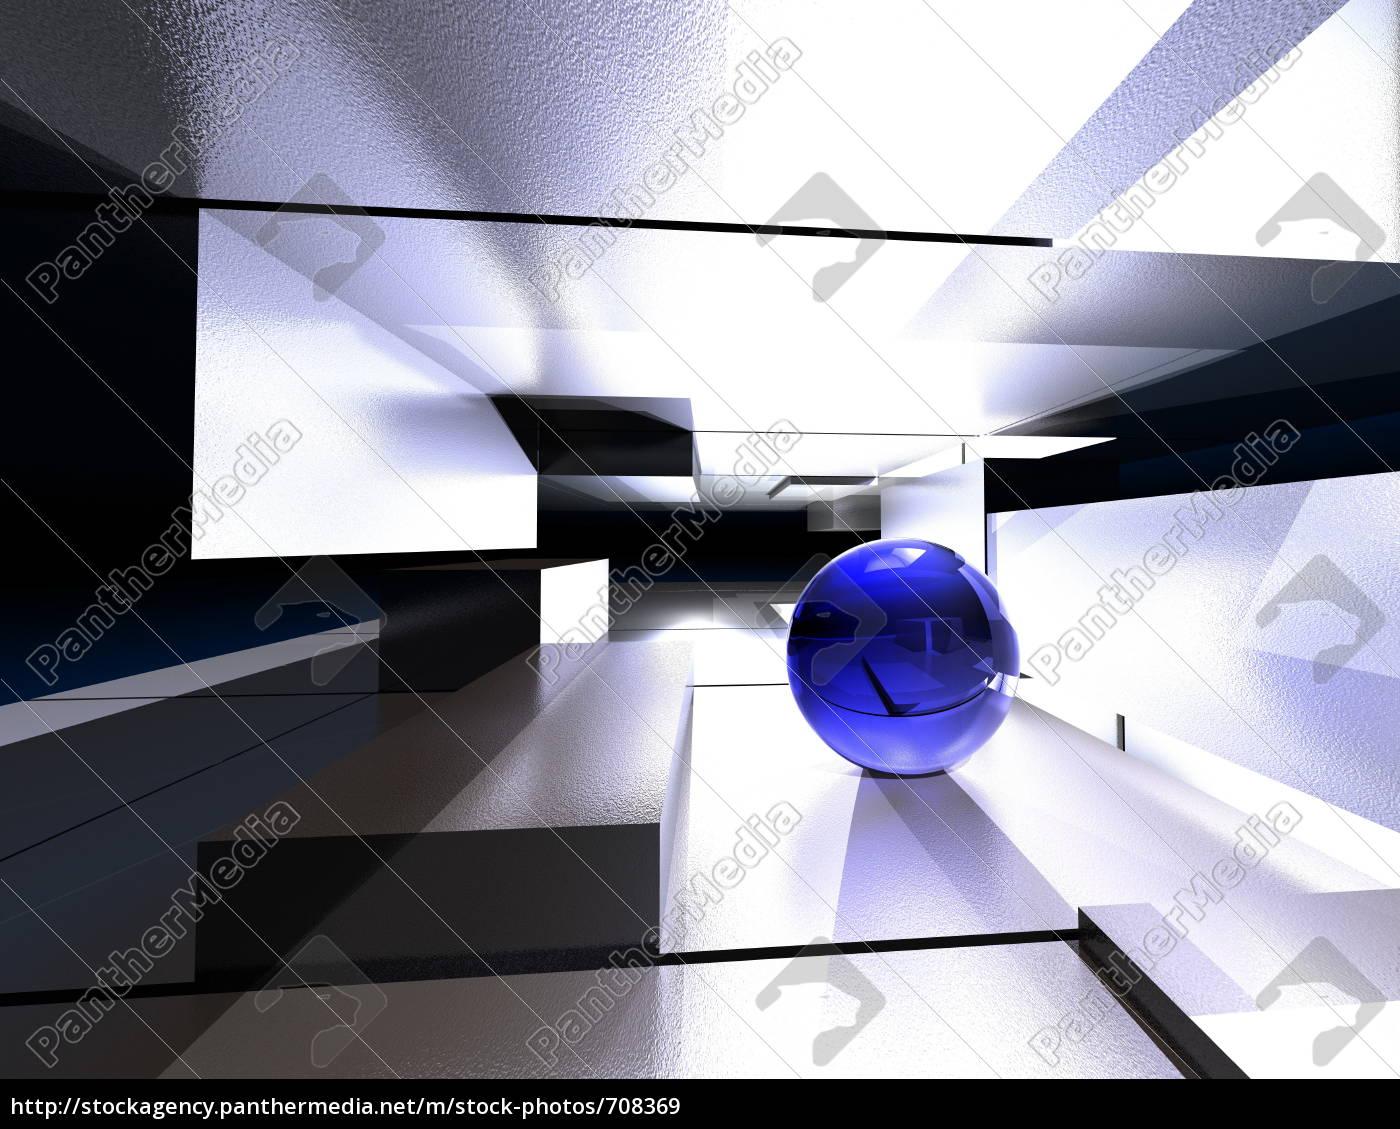 labyrinth - 708369